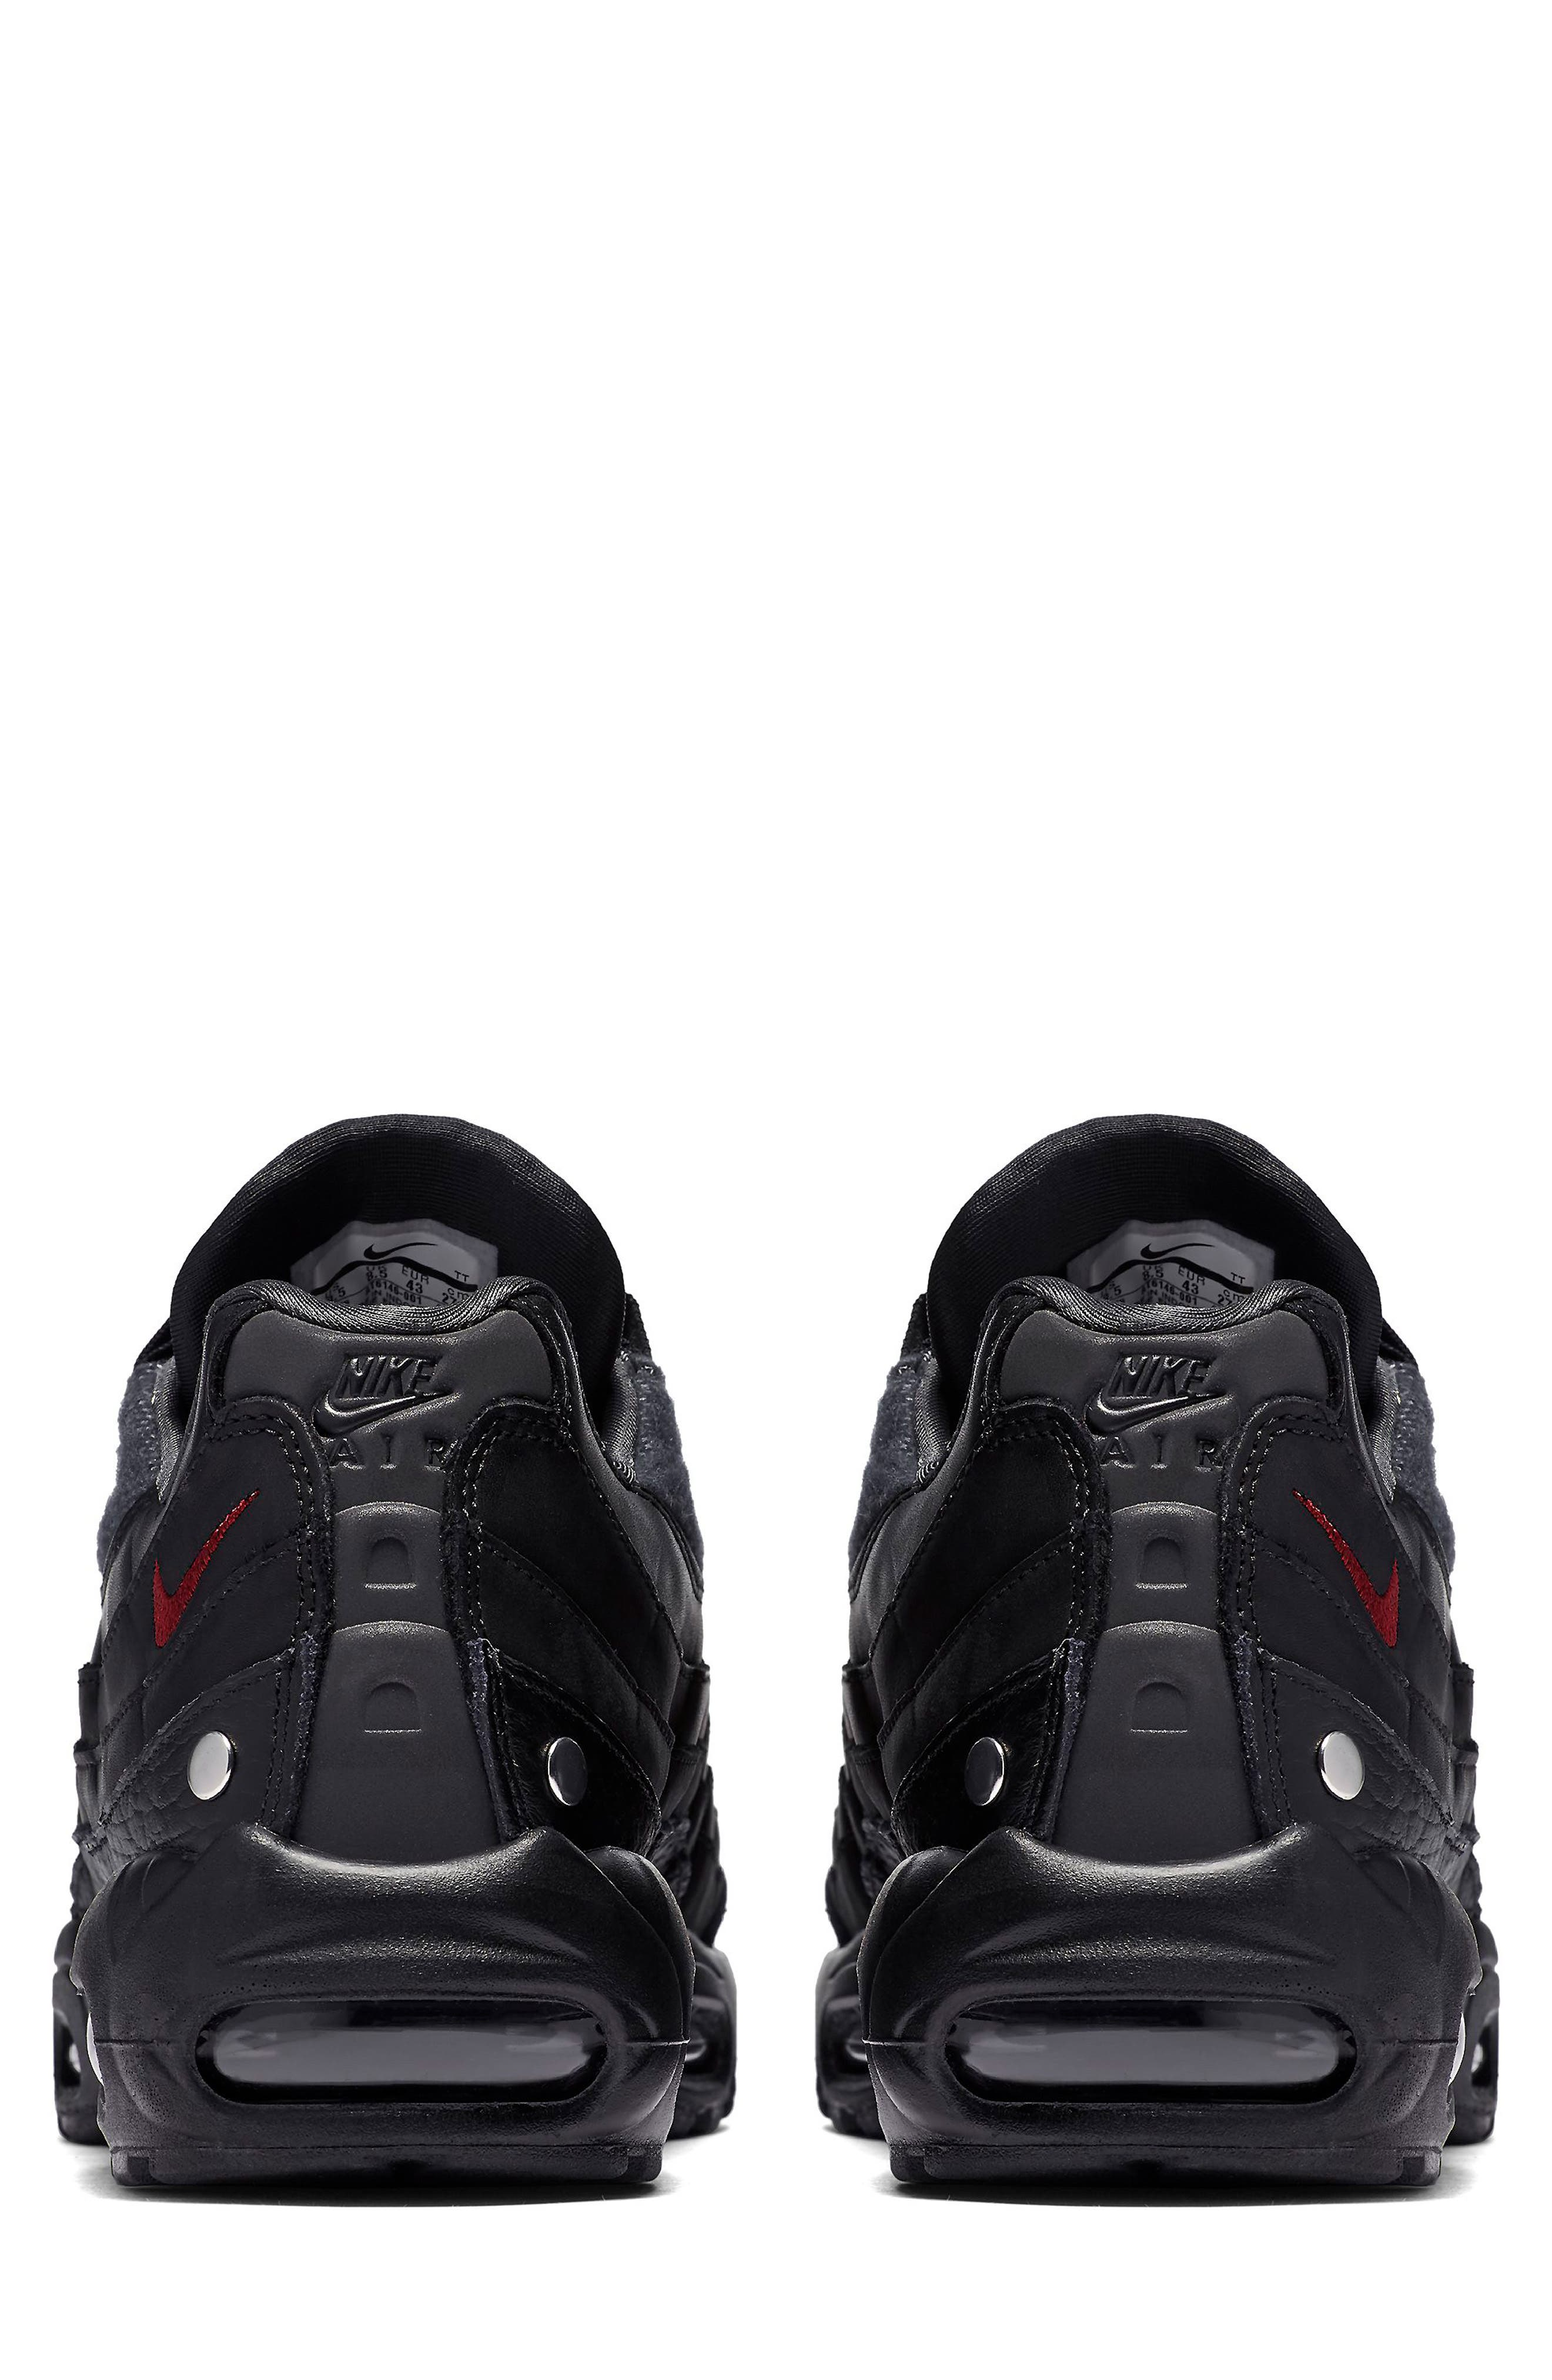 Air Max 95 NRG Sneaker,                             Alternate thumbnail 2, color,                             BLACK/ TEAM RED/ ANTHRACITE